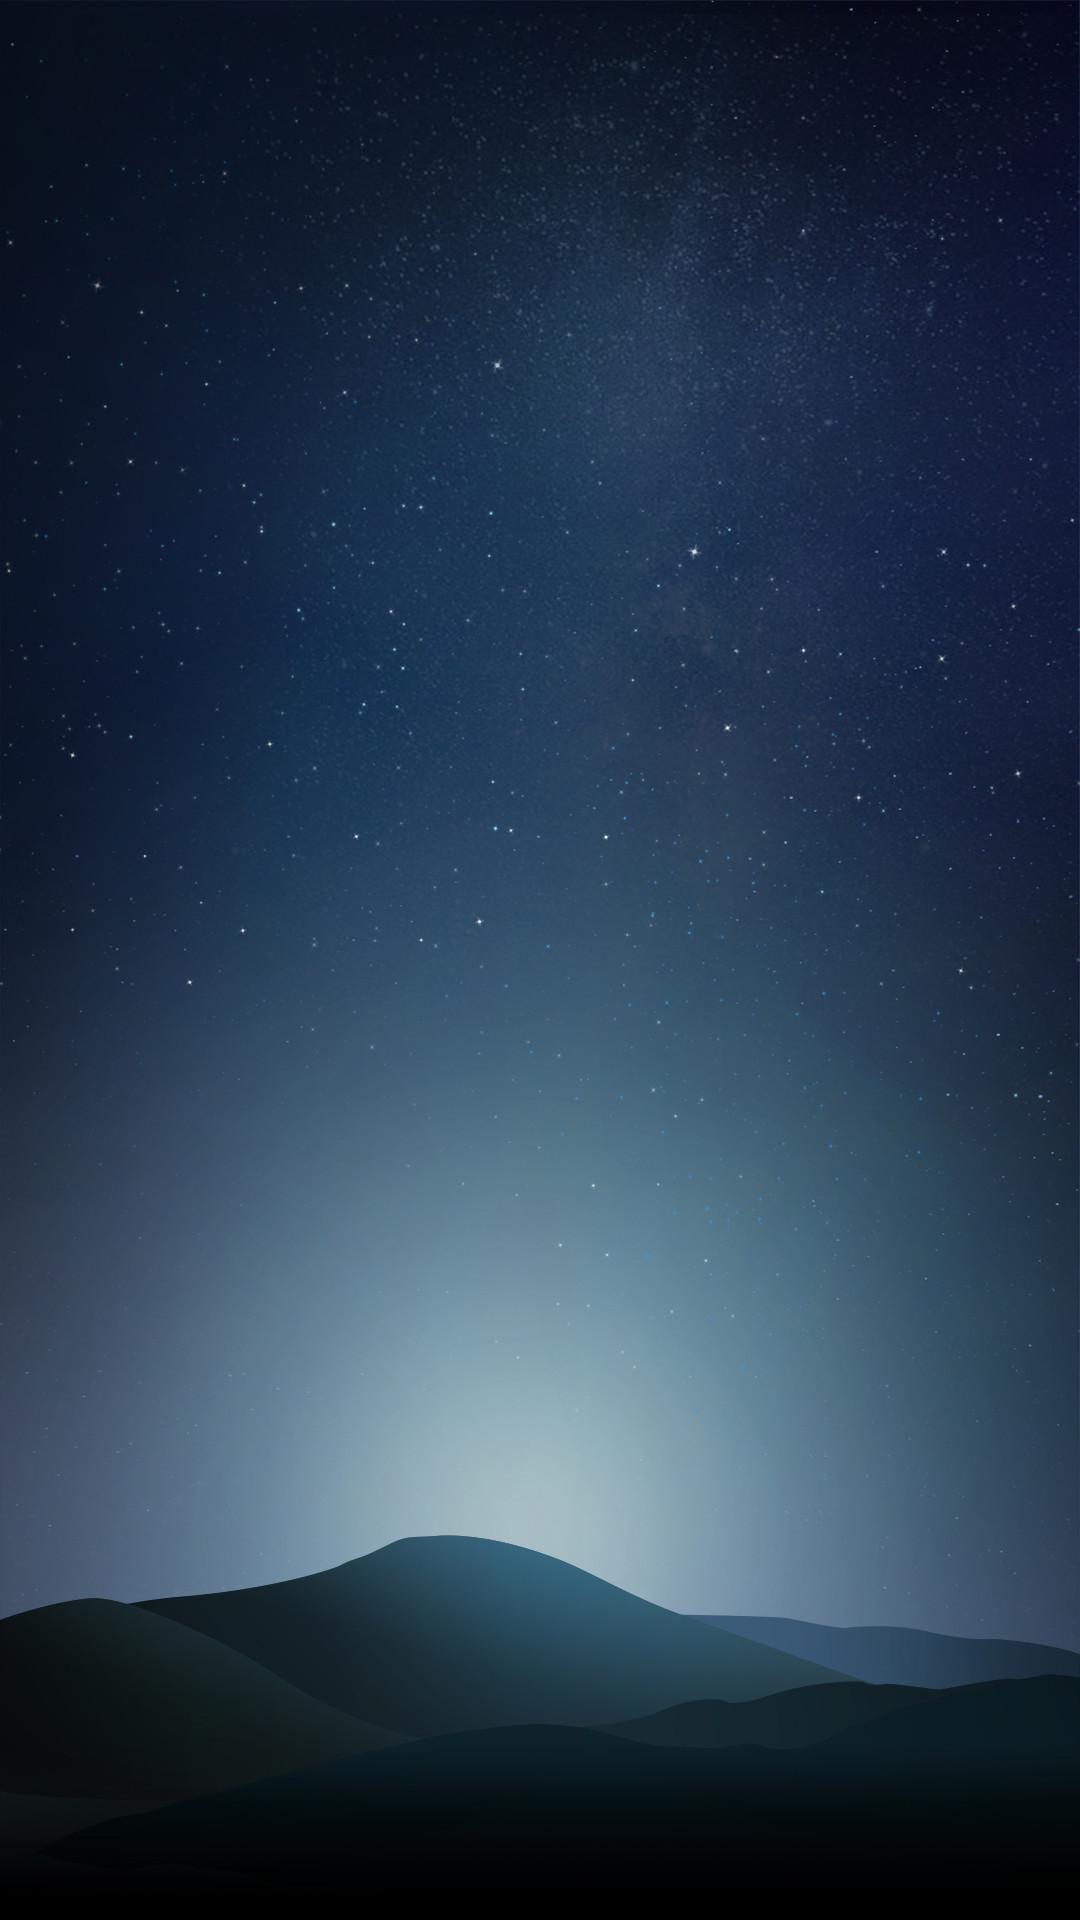 Xiaomi-Mi-A1-Stock-Wallpapers-ThemeFoxx